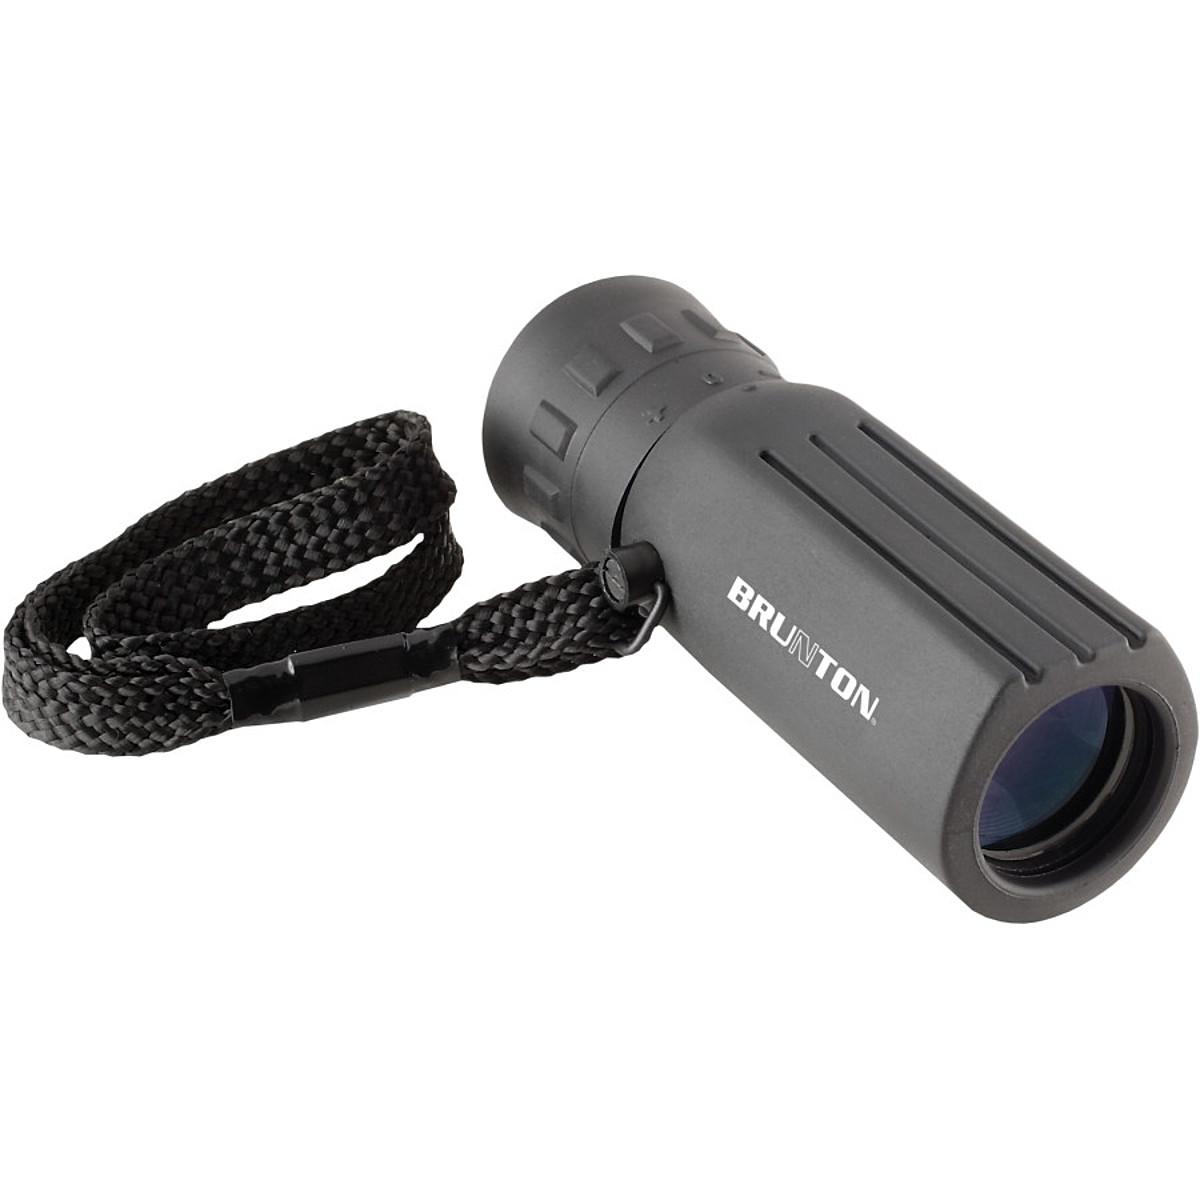 photo: Brunton Lite Tech Monocular navigation tool